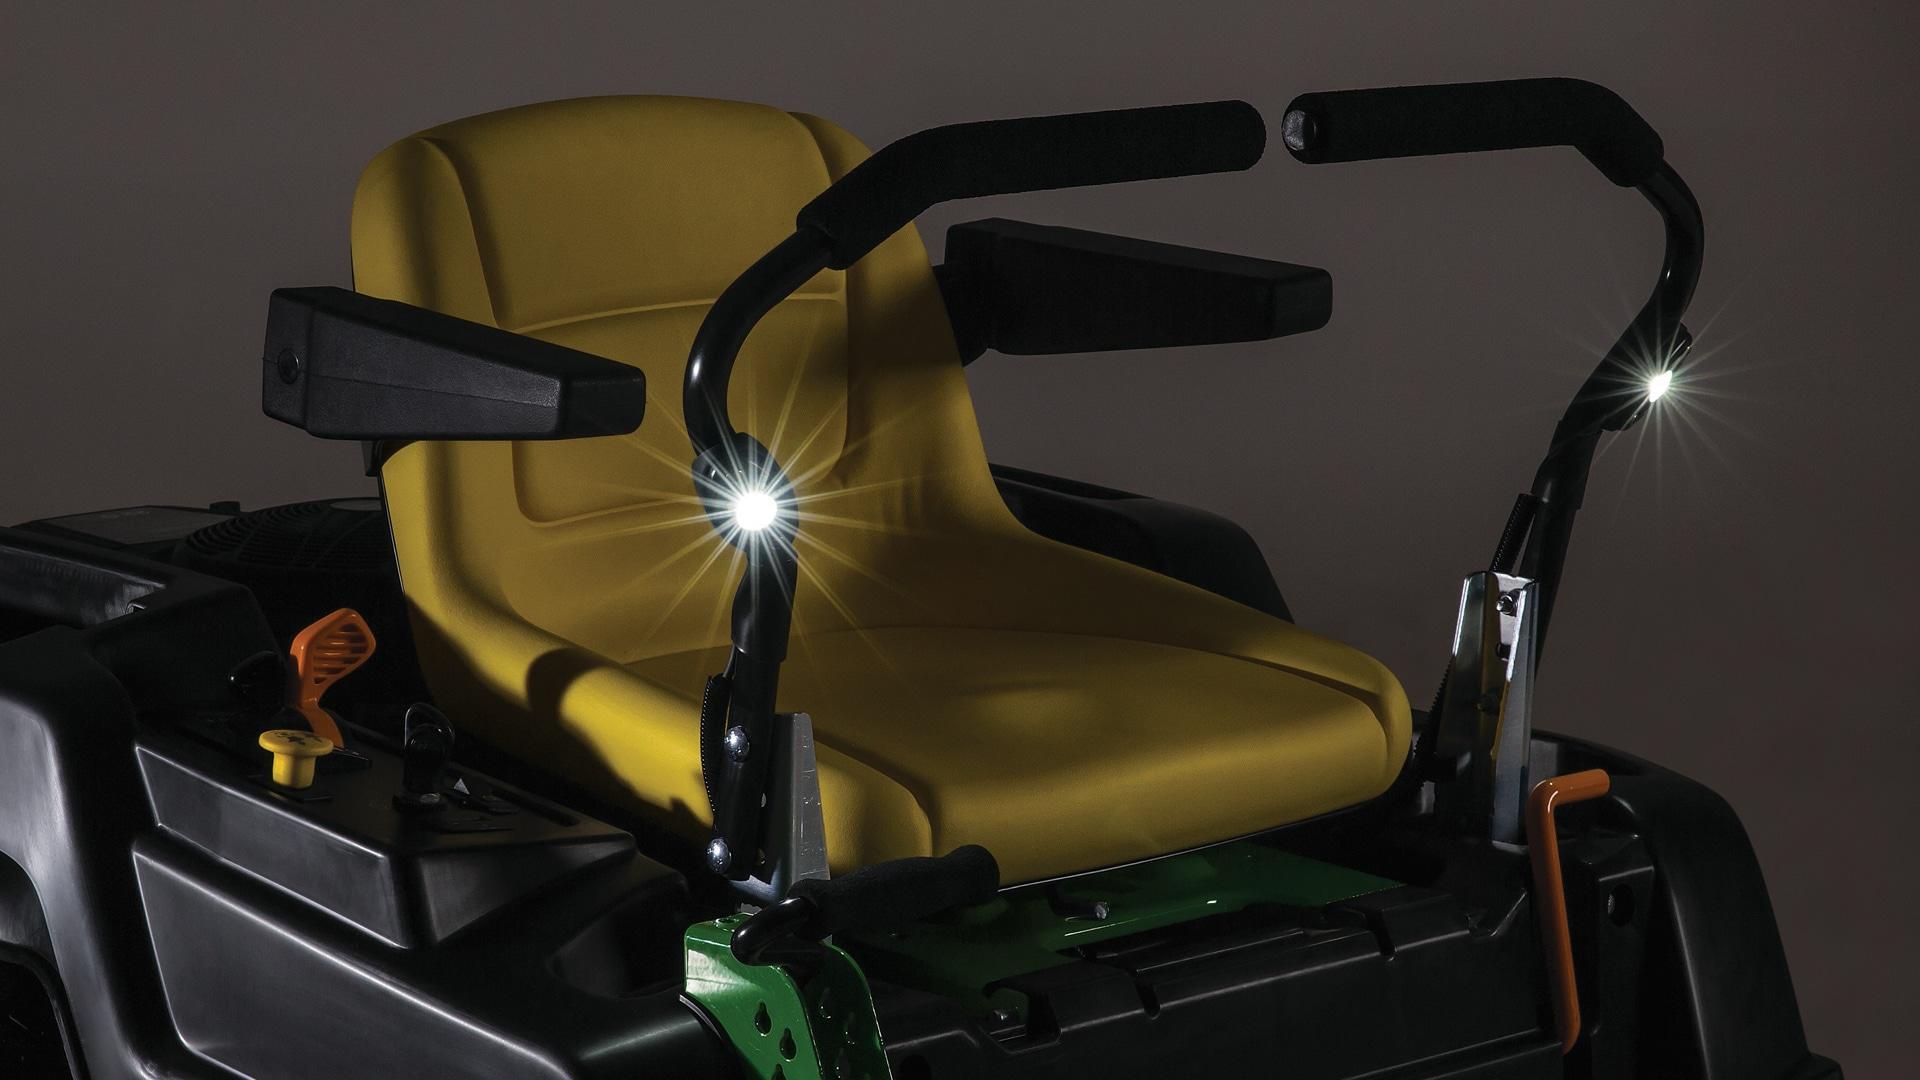 Riding Lawn Equipment Attachments | John Deere US